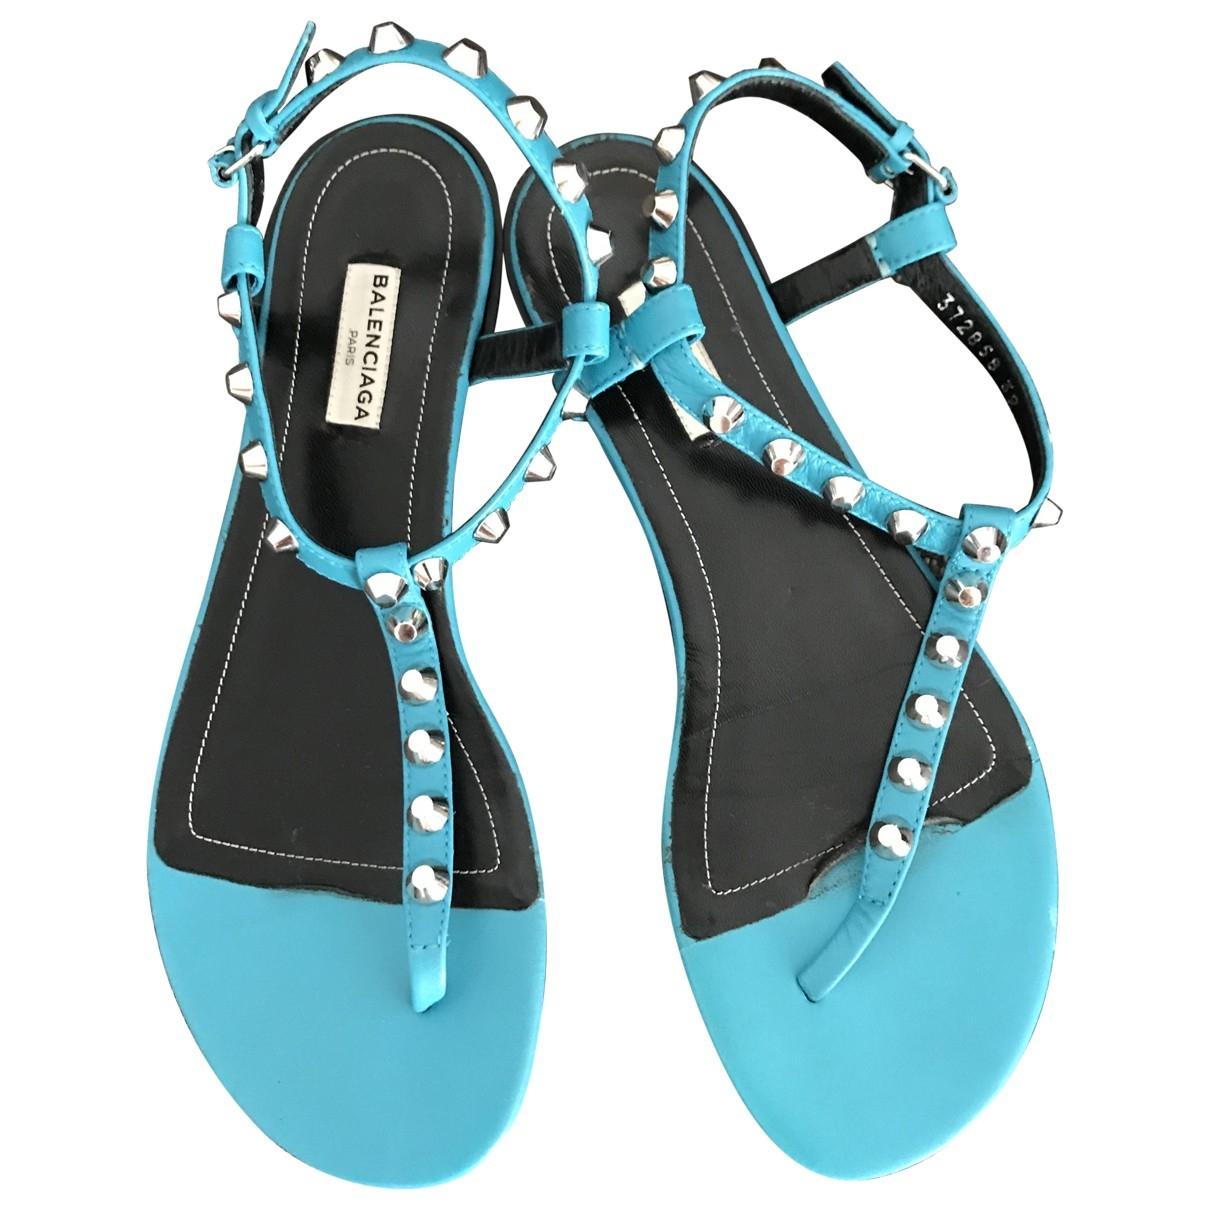 Balenciaga \N Turquoise Leather Sandals for Women 39 EU